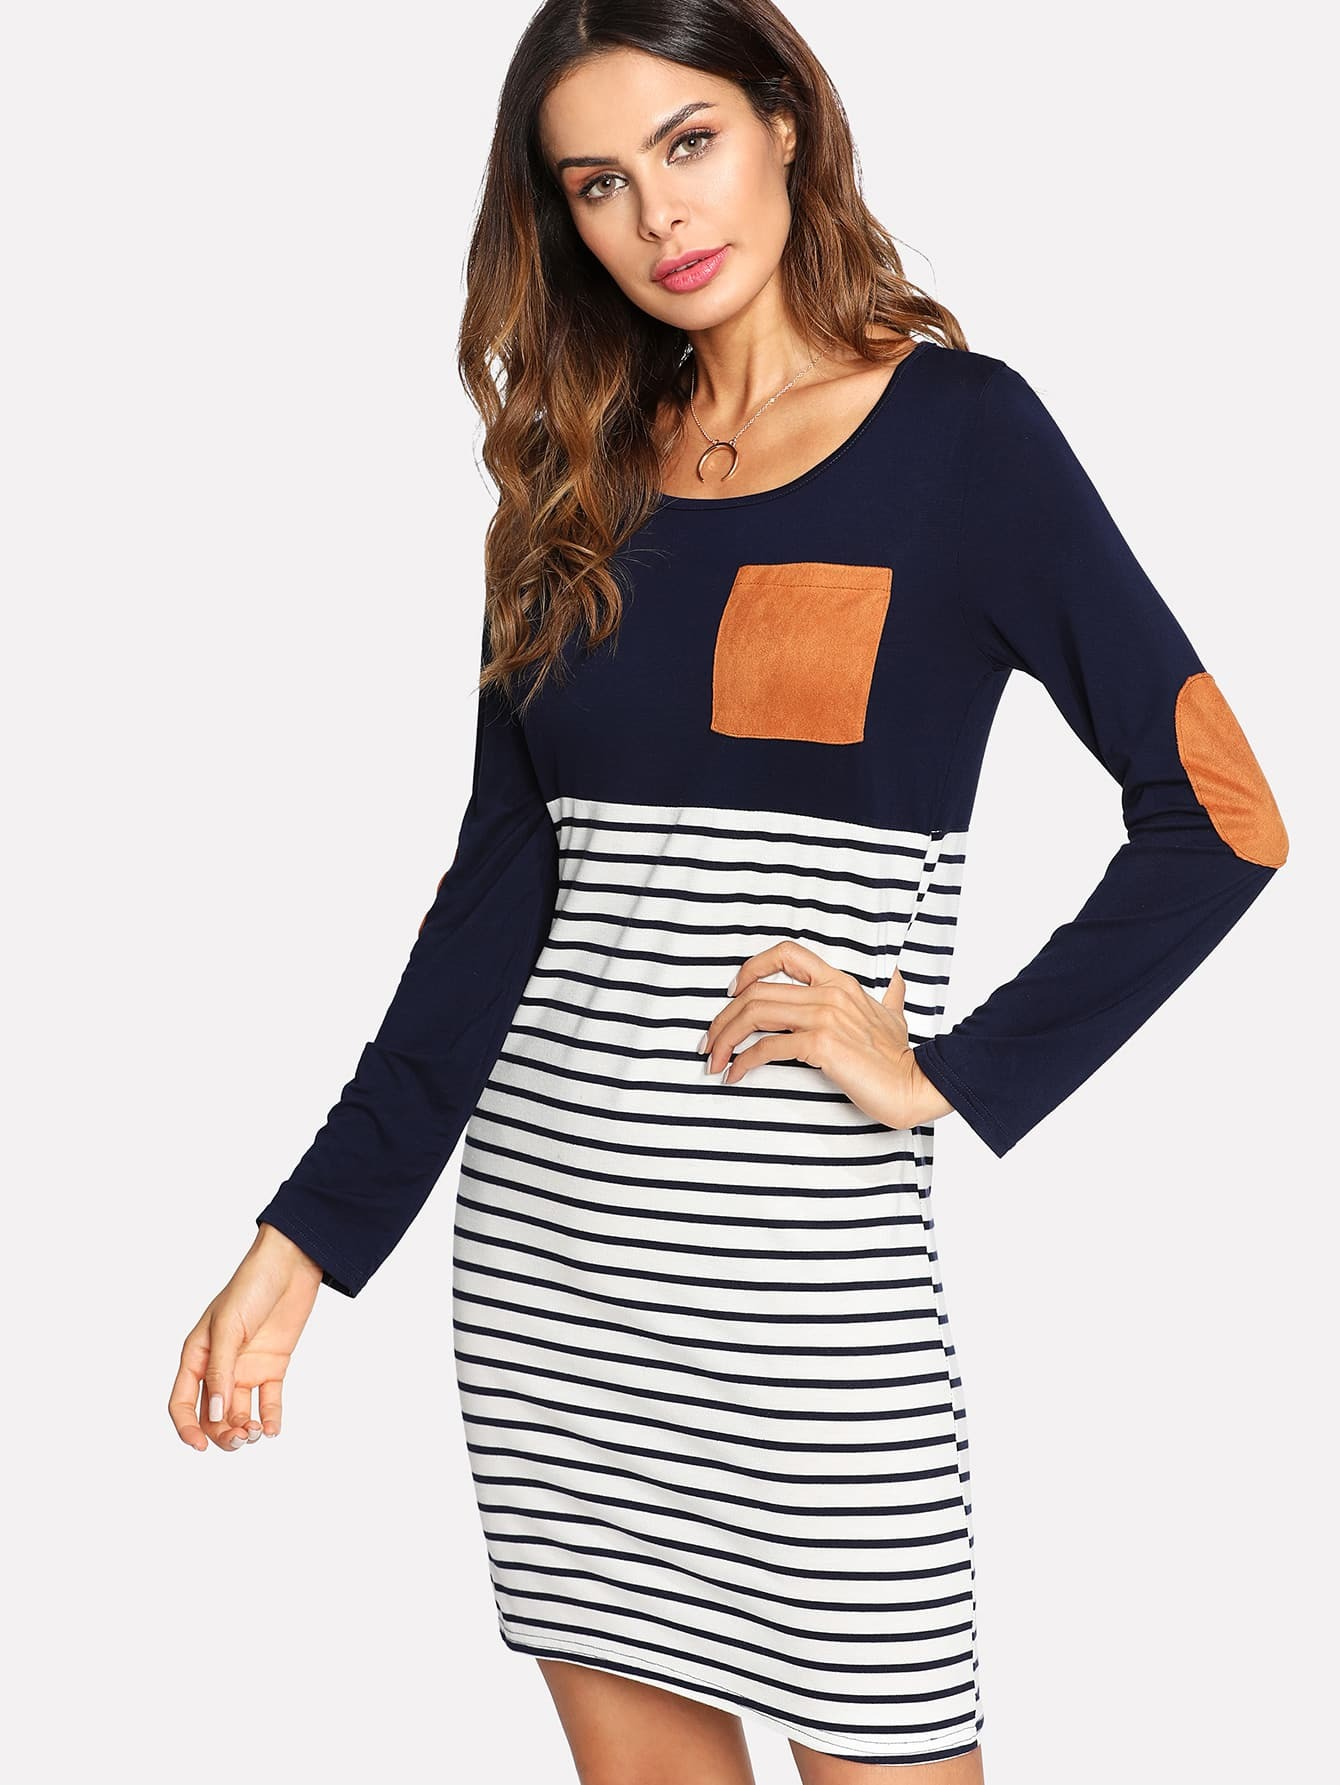 Contrast Suede Patches Striped Dress feron gs m361 18896